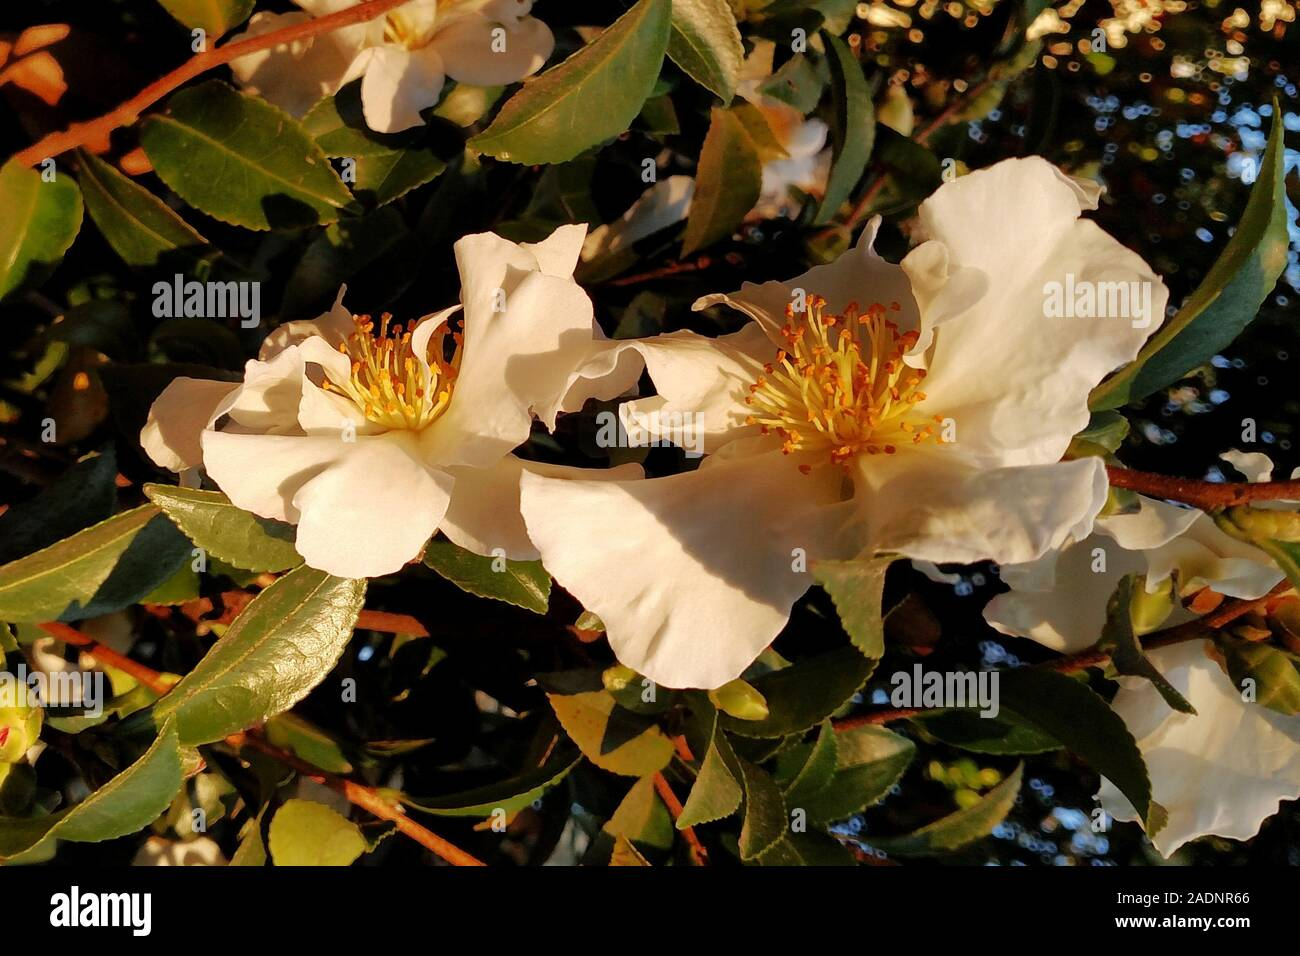 Sasanqua Flowers Stock Photos Sasanqua Flowers Stock Images Alamy